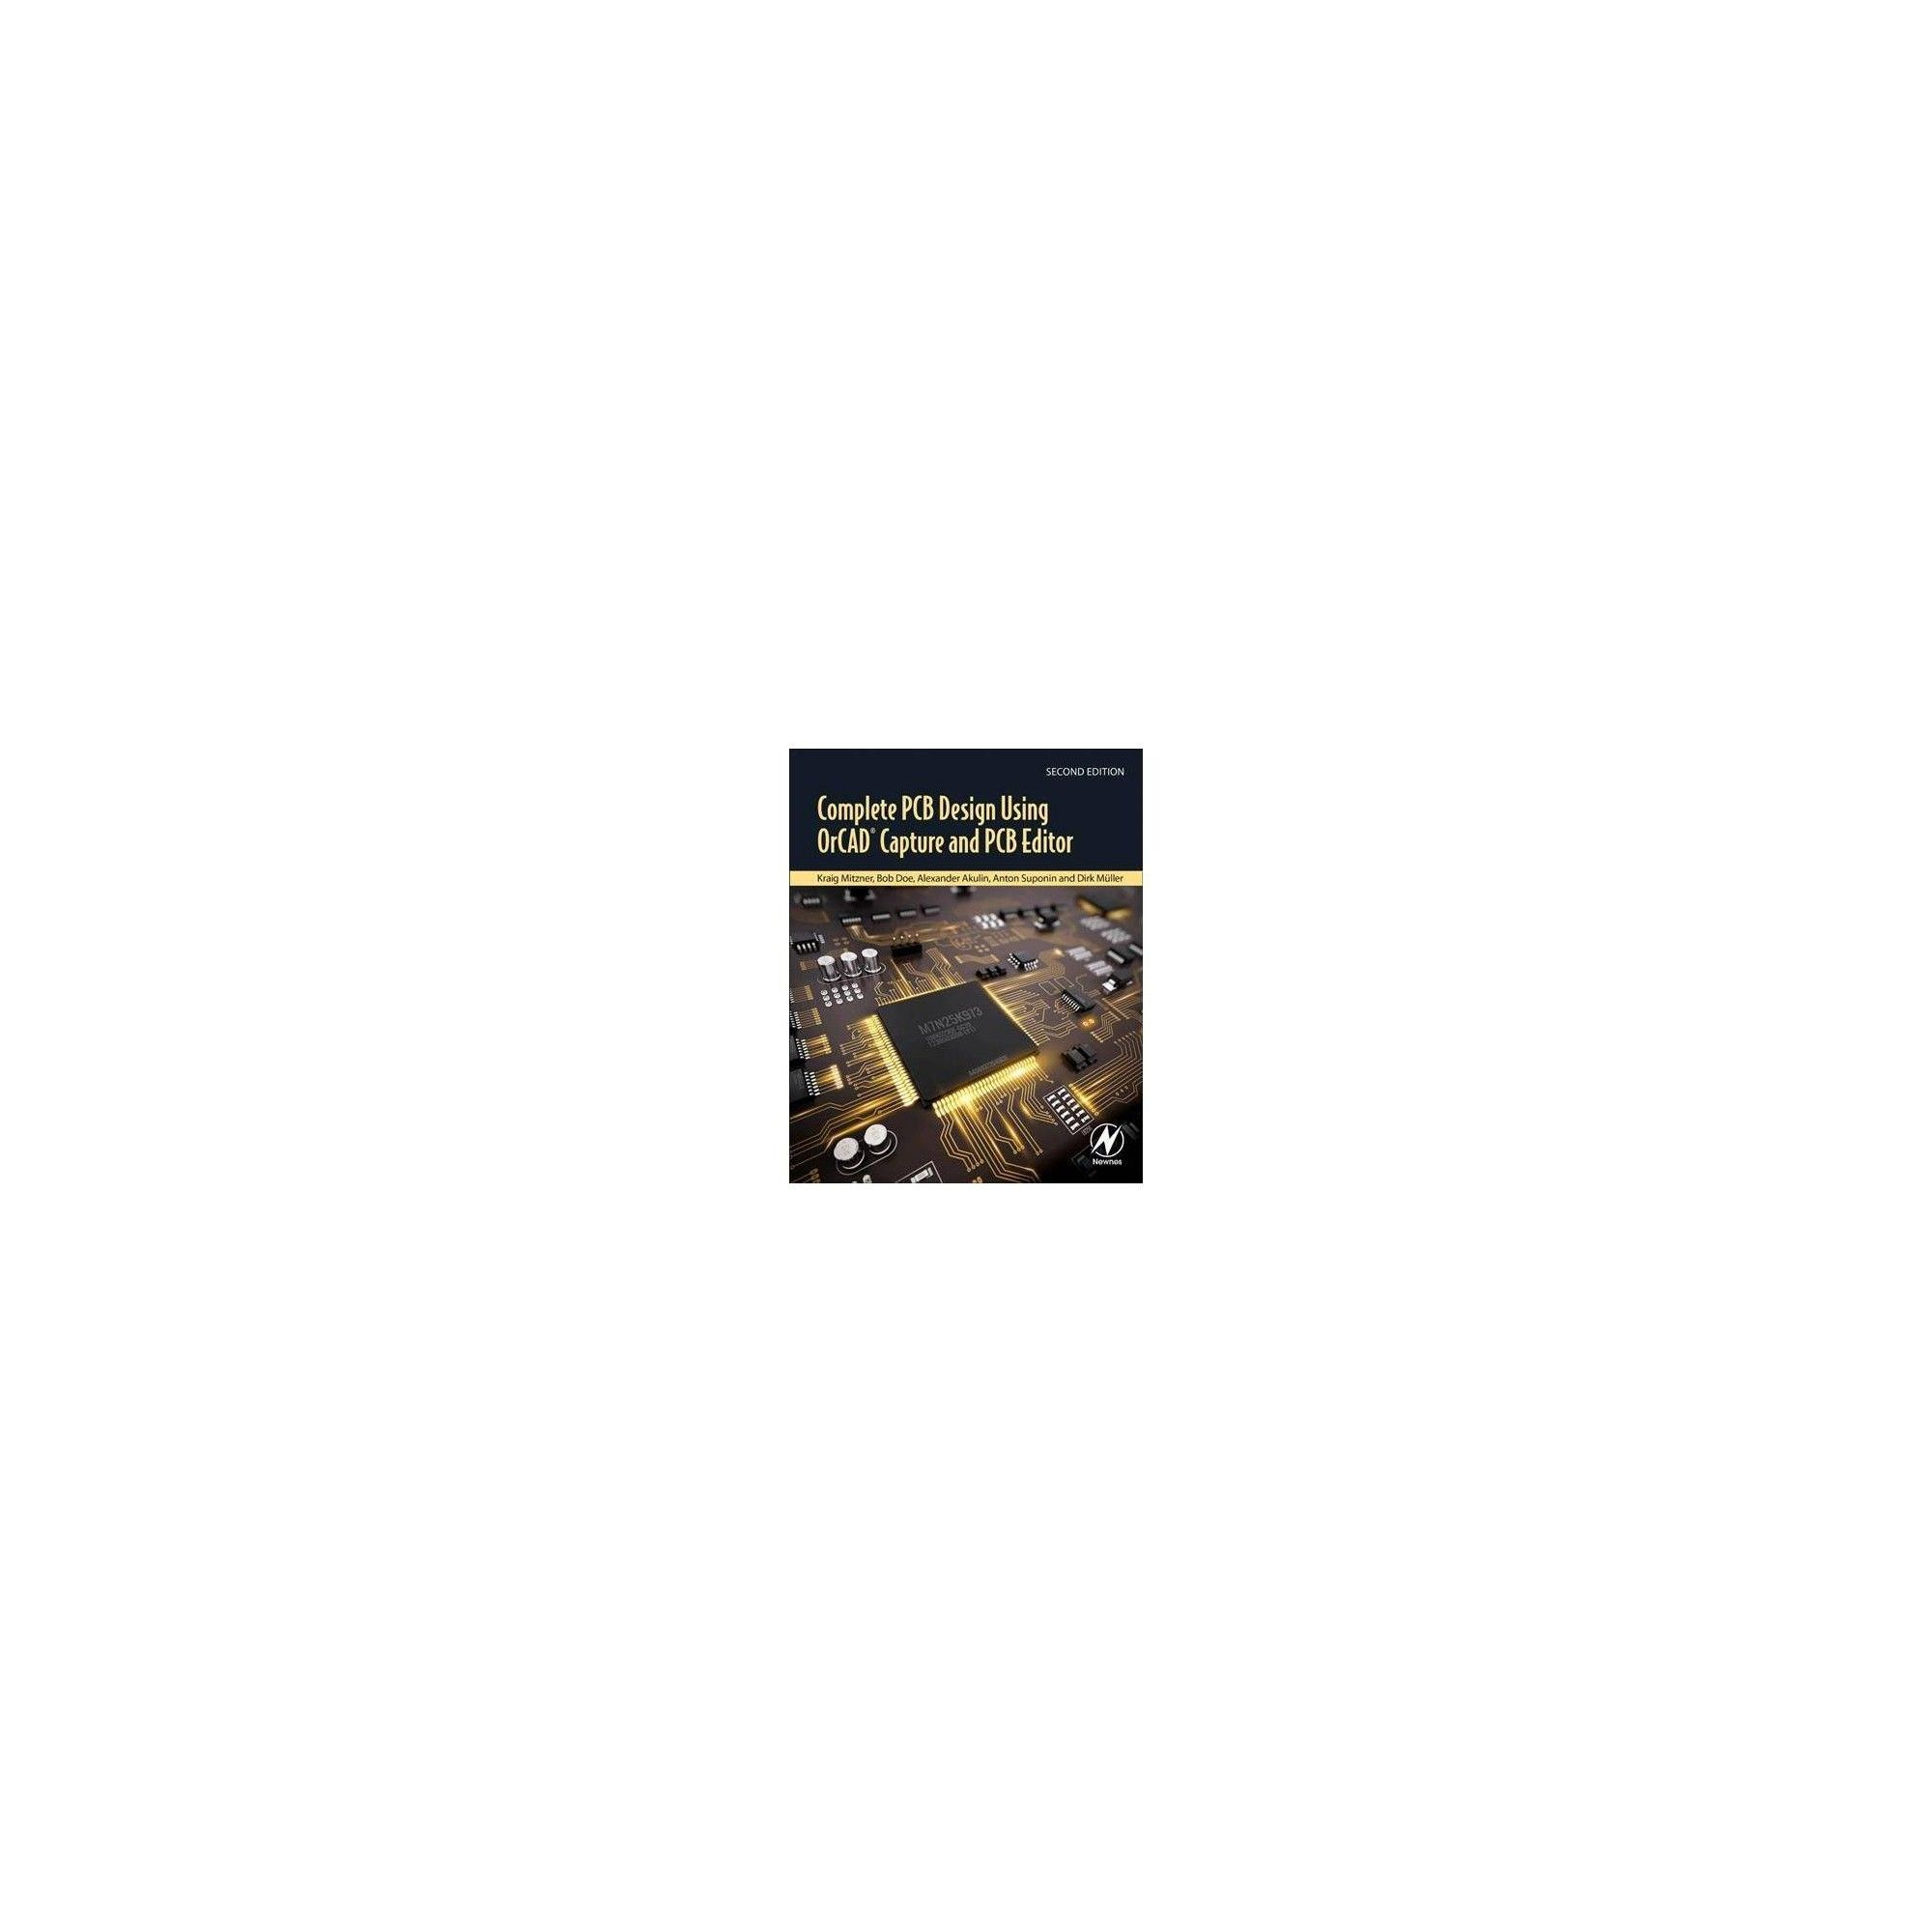 Complete Pcb Design Using Orcad Capture And Pcb Editor 2 By Kraig Mitzner Paperback Pcb Design Schematic Design Paperbacks